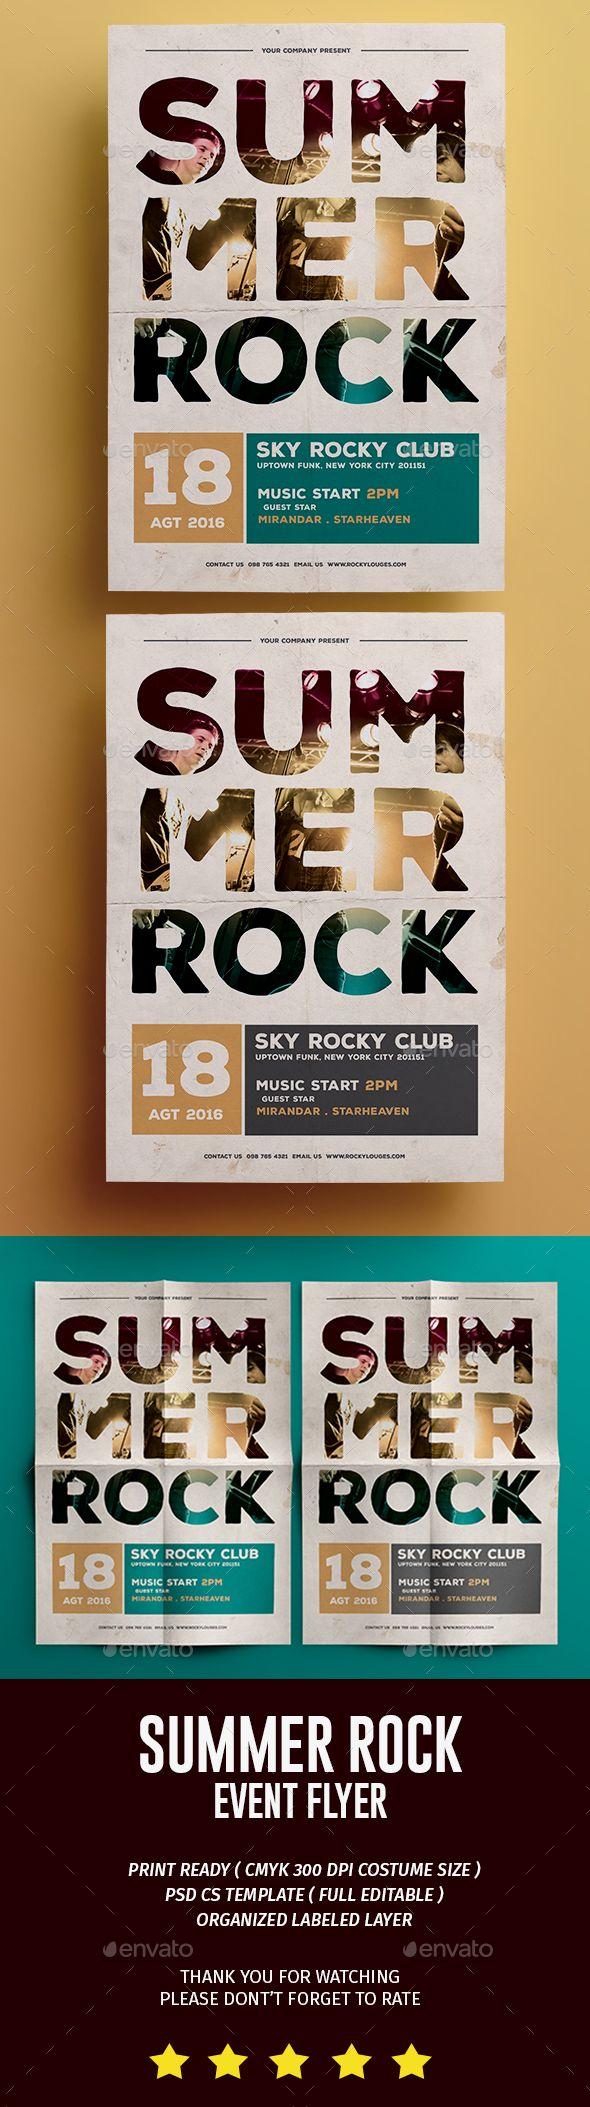 70s poster design template - Summer Rock Flyer